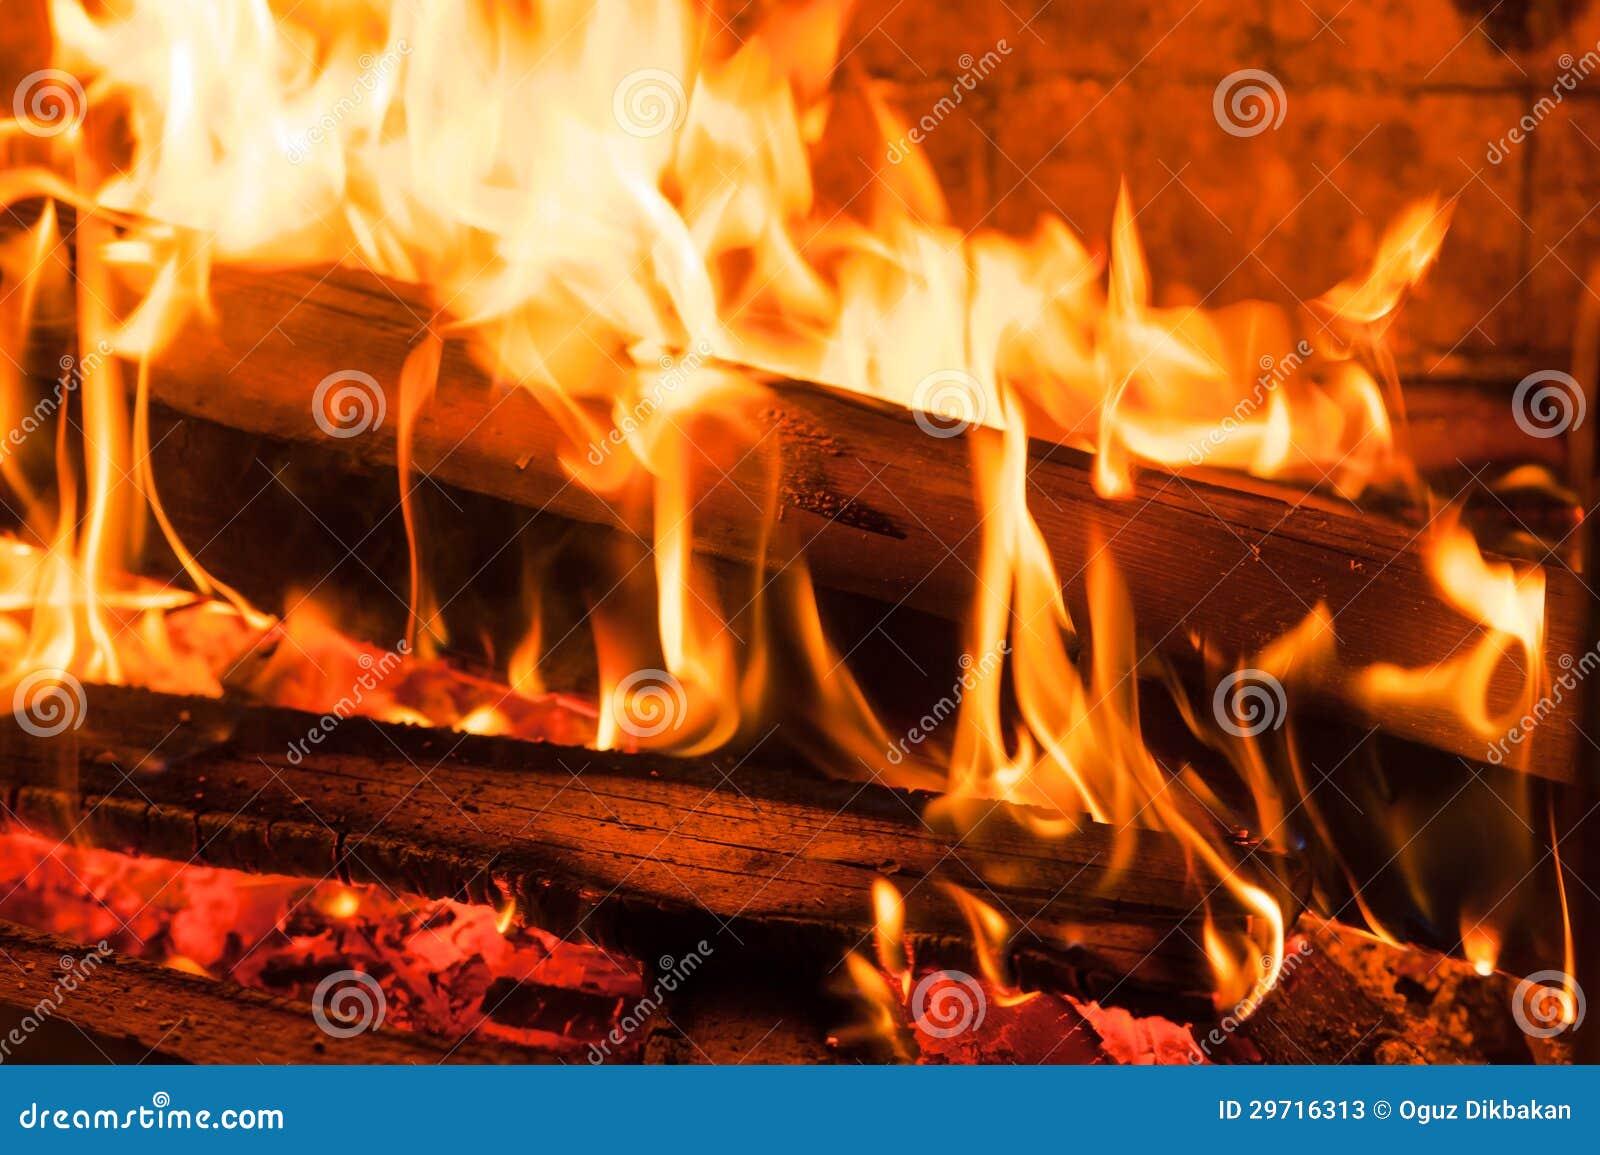 burning woods ember in fireplace stock photos image 29716313